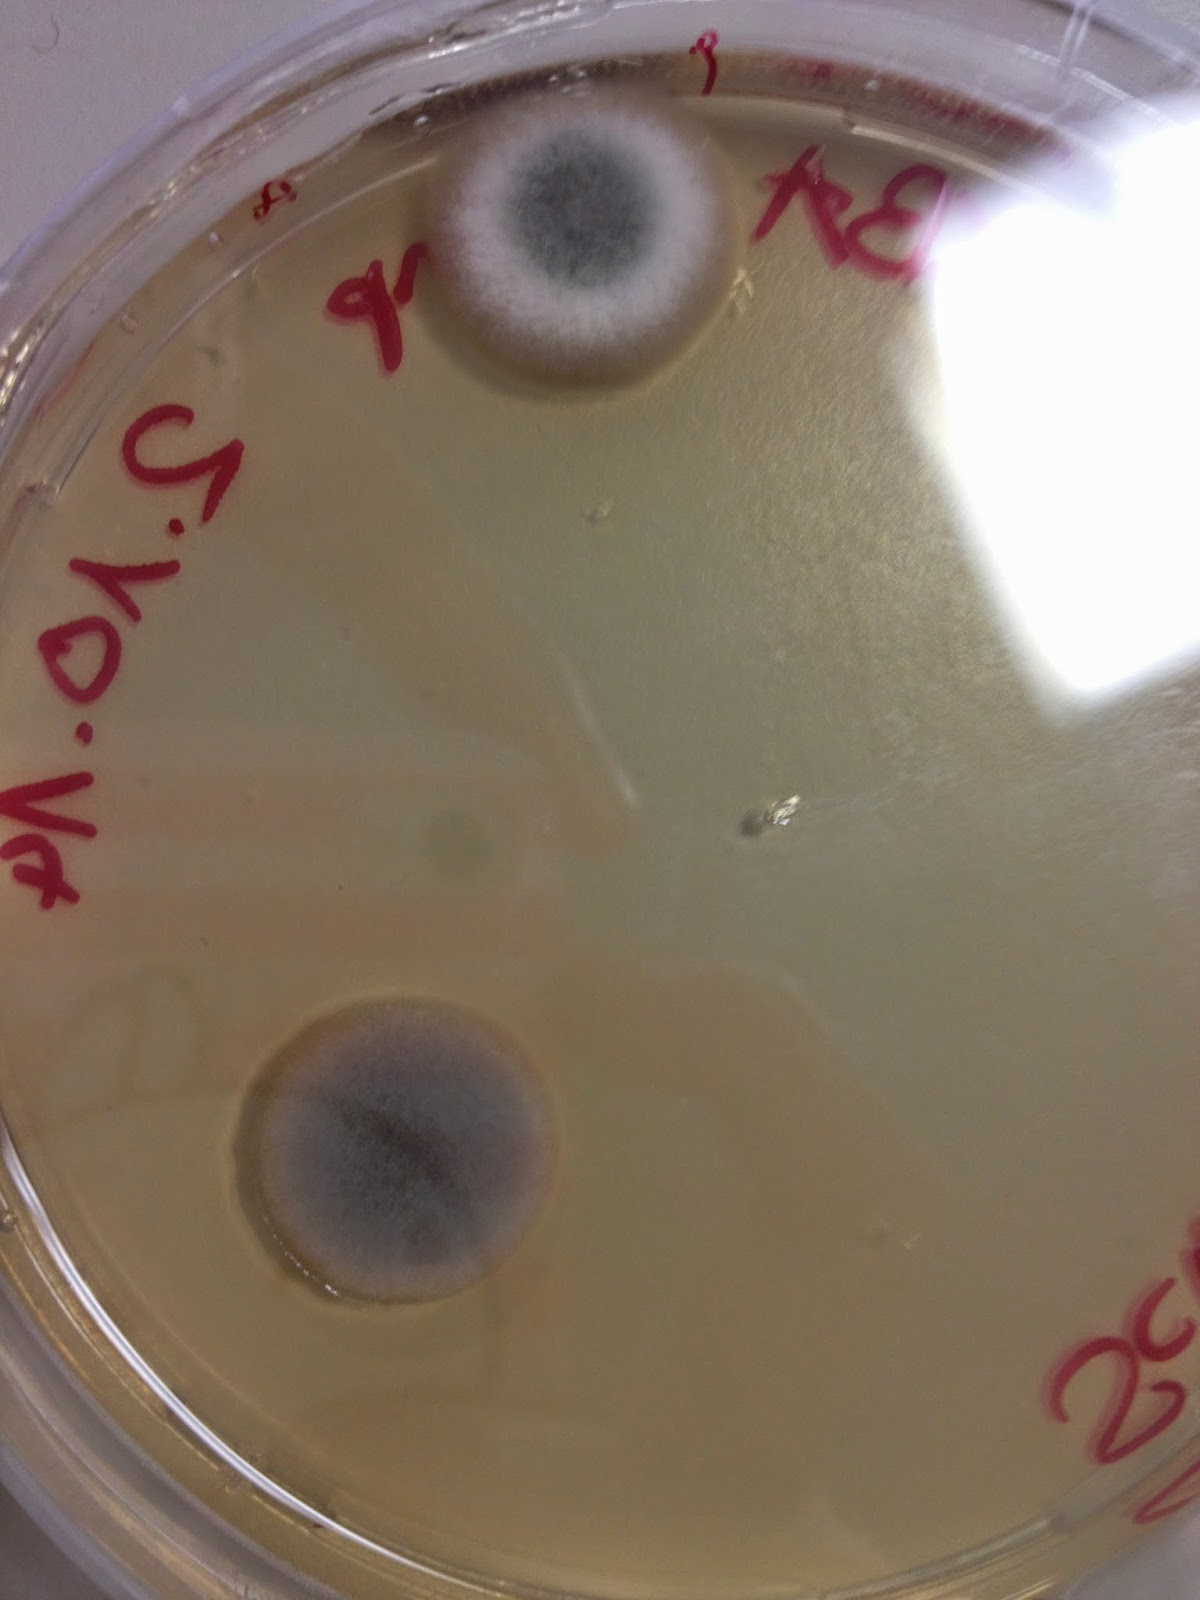 hydroxyzine atarax dose effects